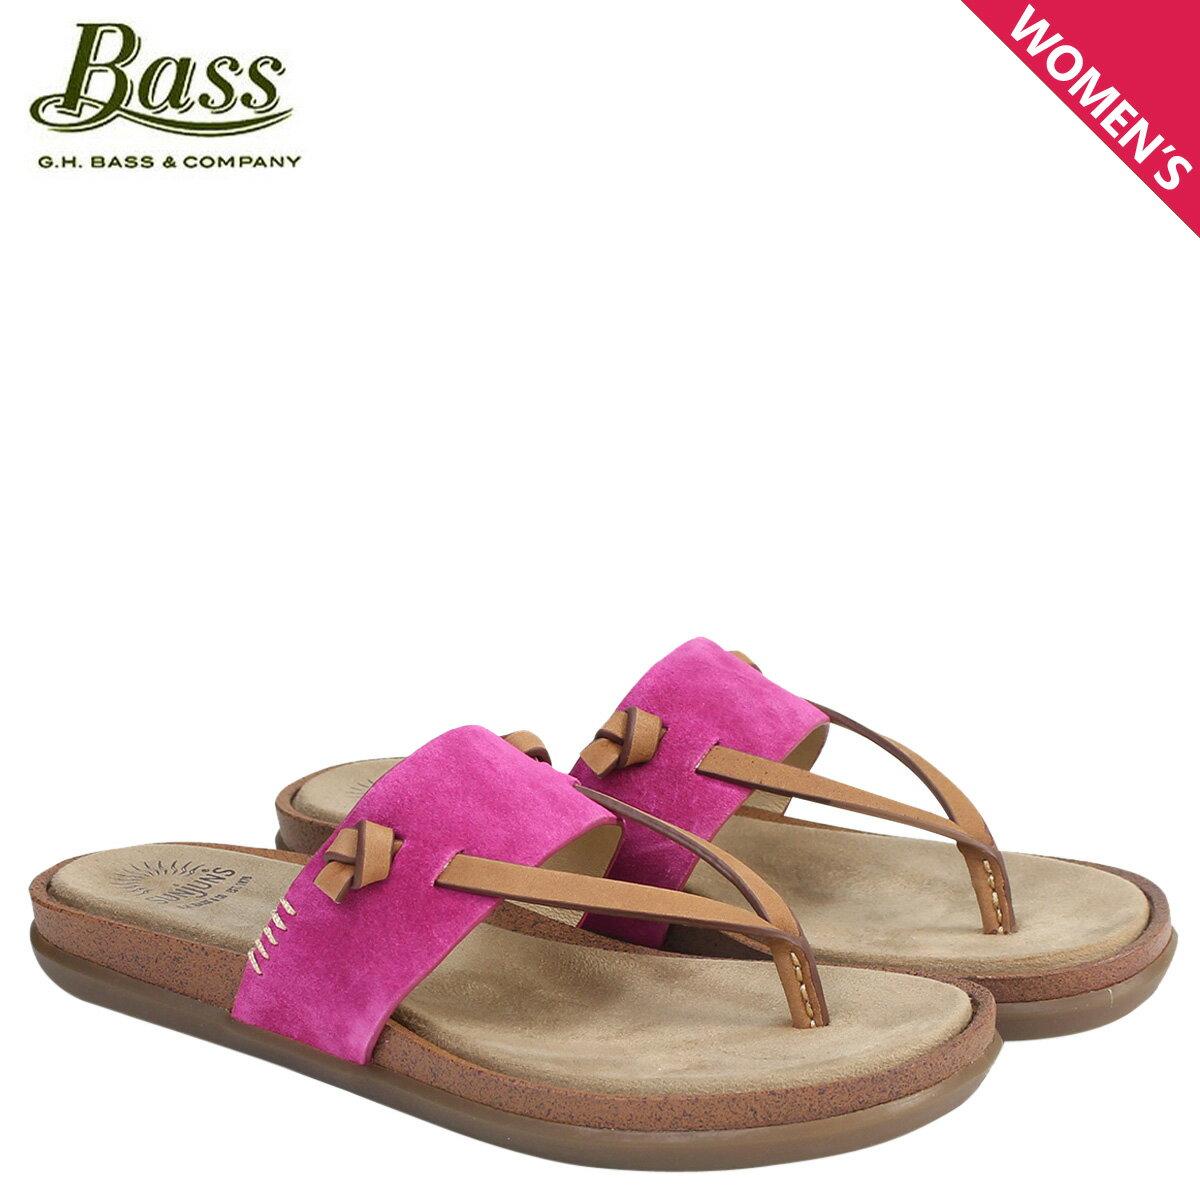 G.H. BASS サンダル レディース ジーエイチバス トングサンダル SHANNON THONG SUNJUNS 71-23018 靴 ピンク